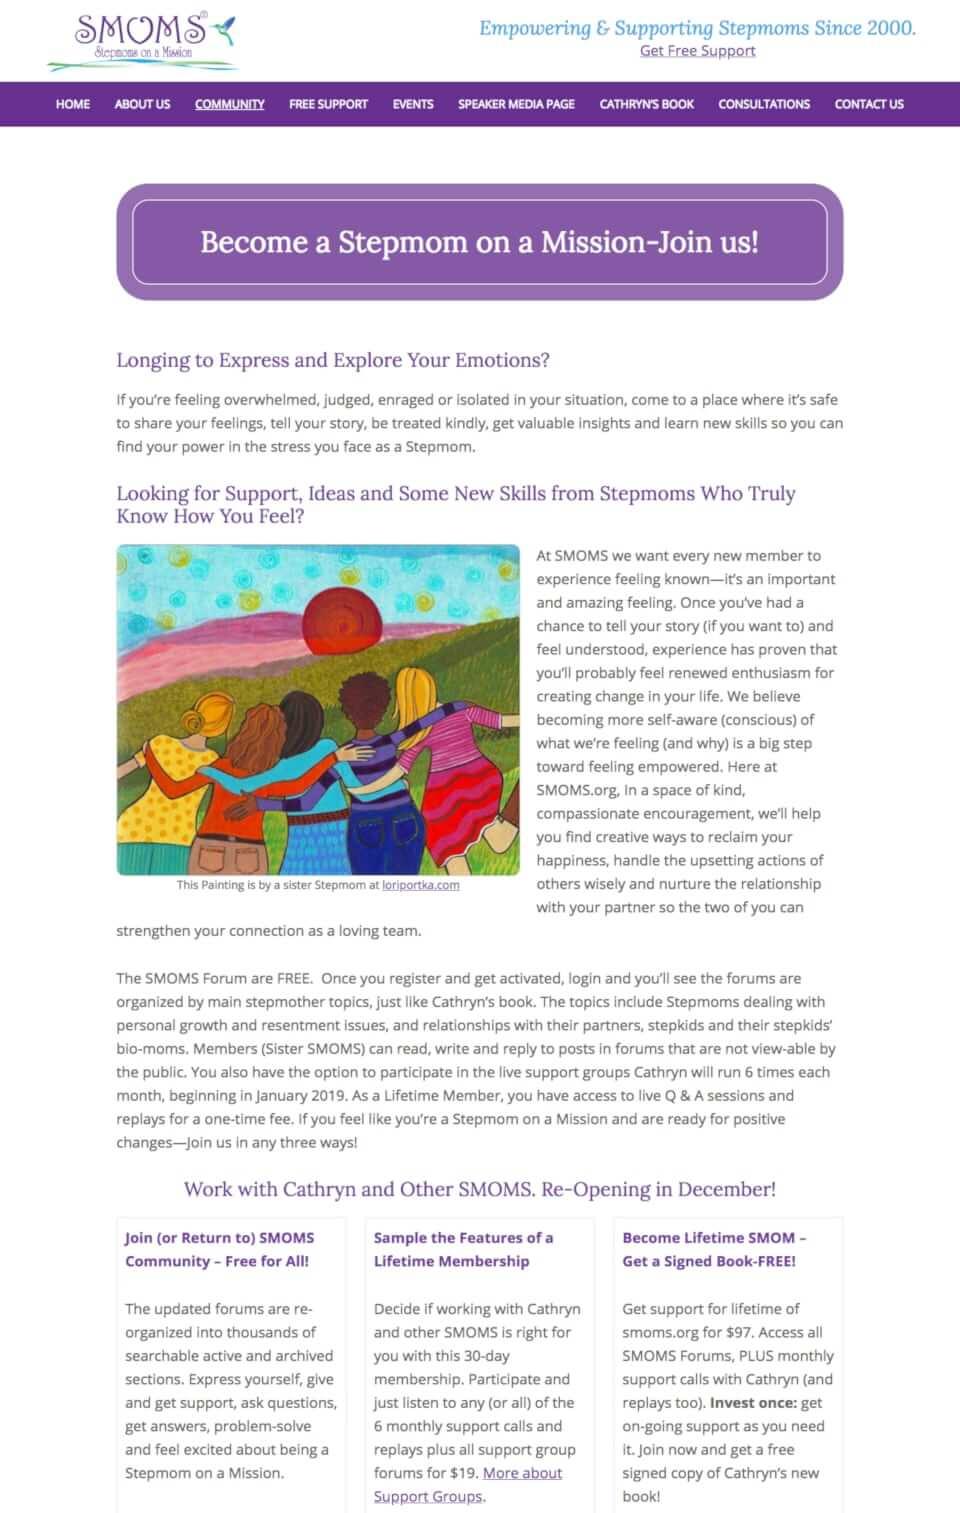 custom genesis website design stepmoms support group secondary page